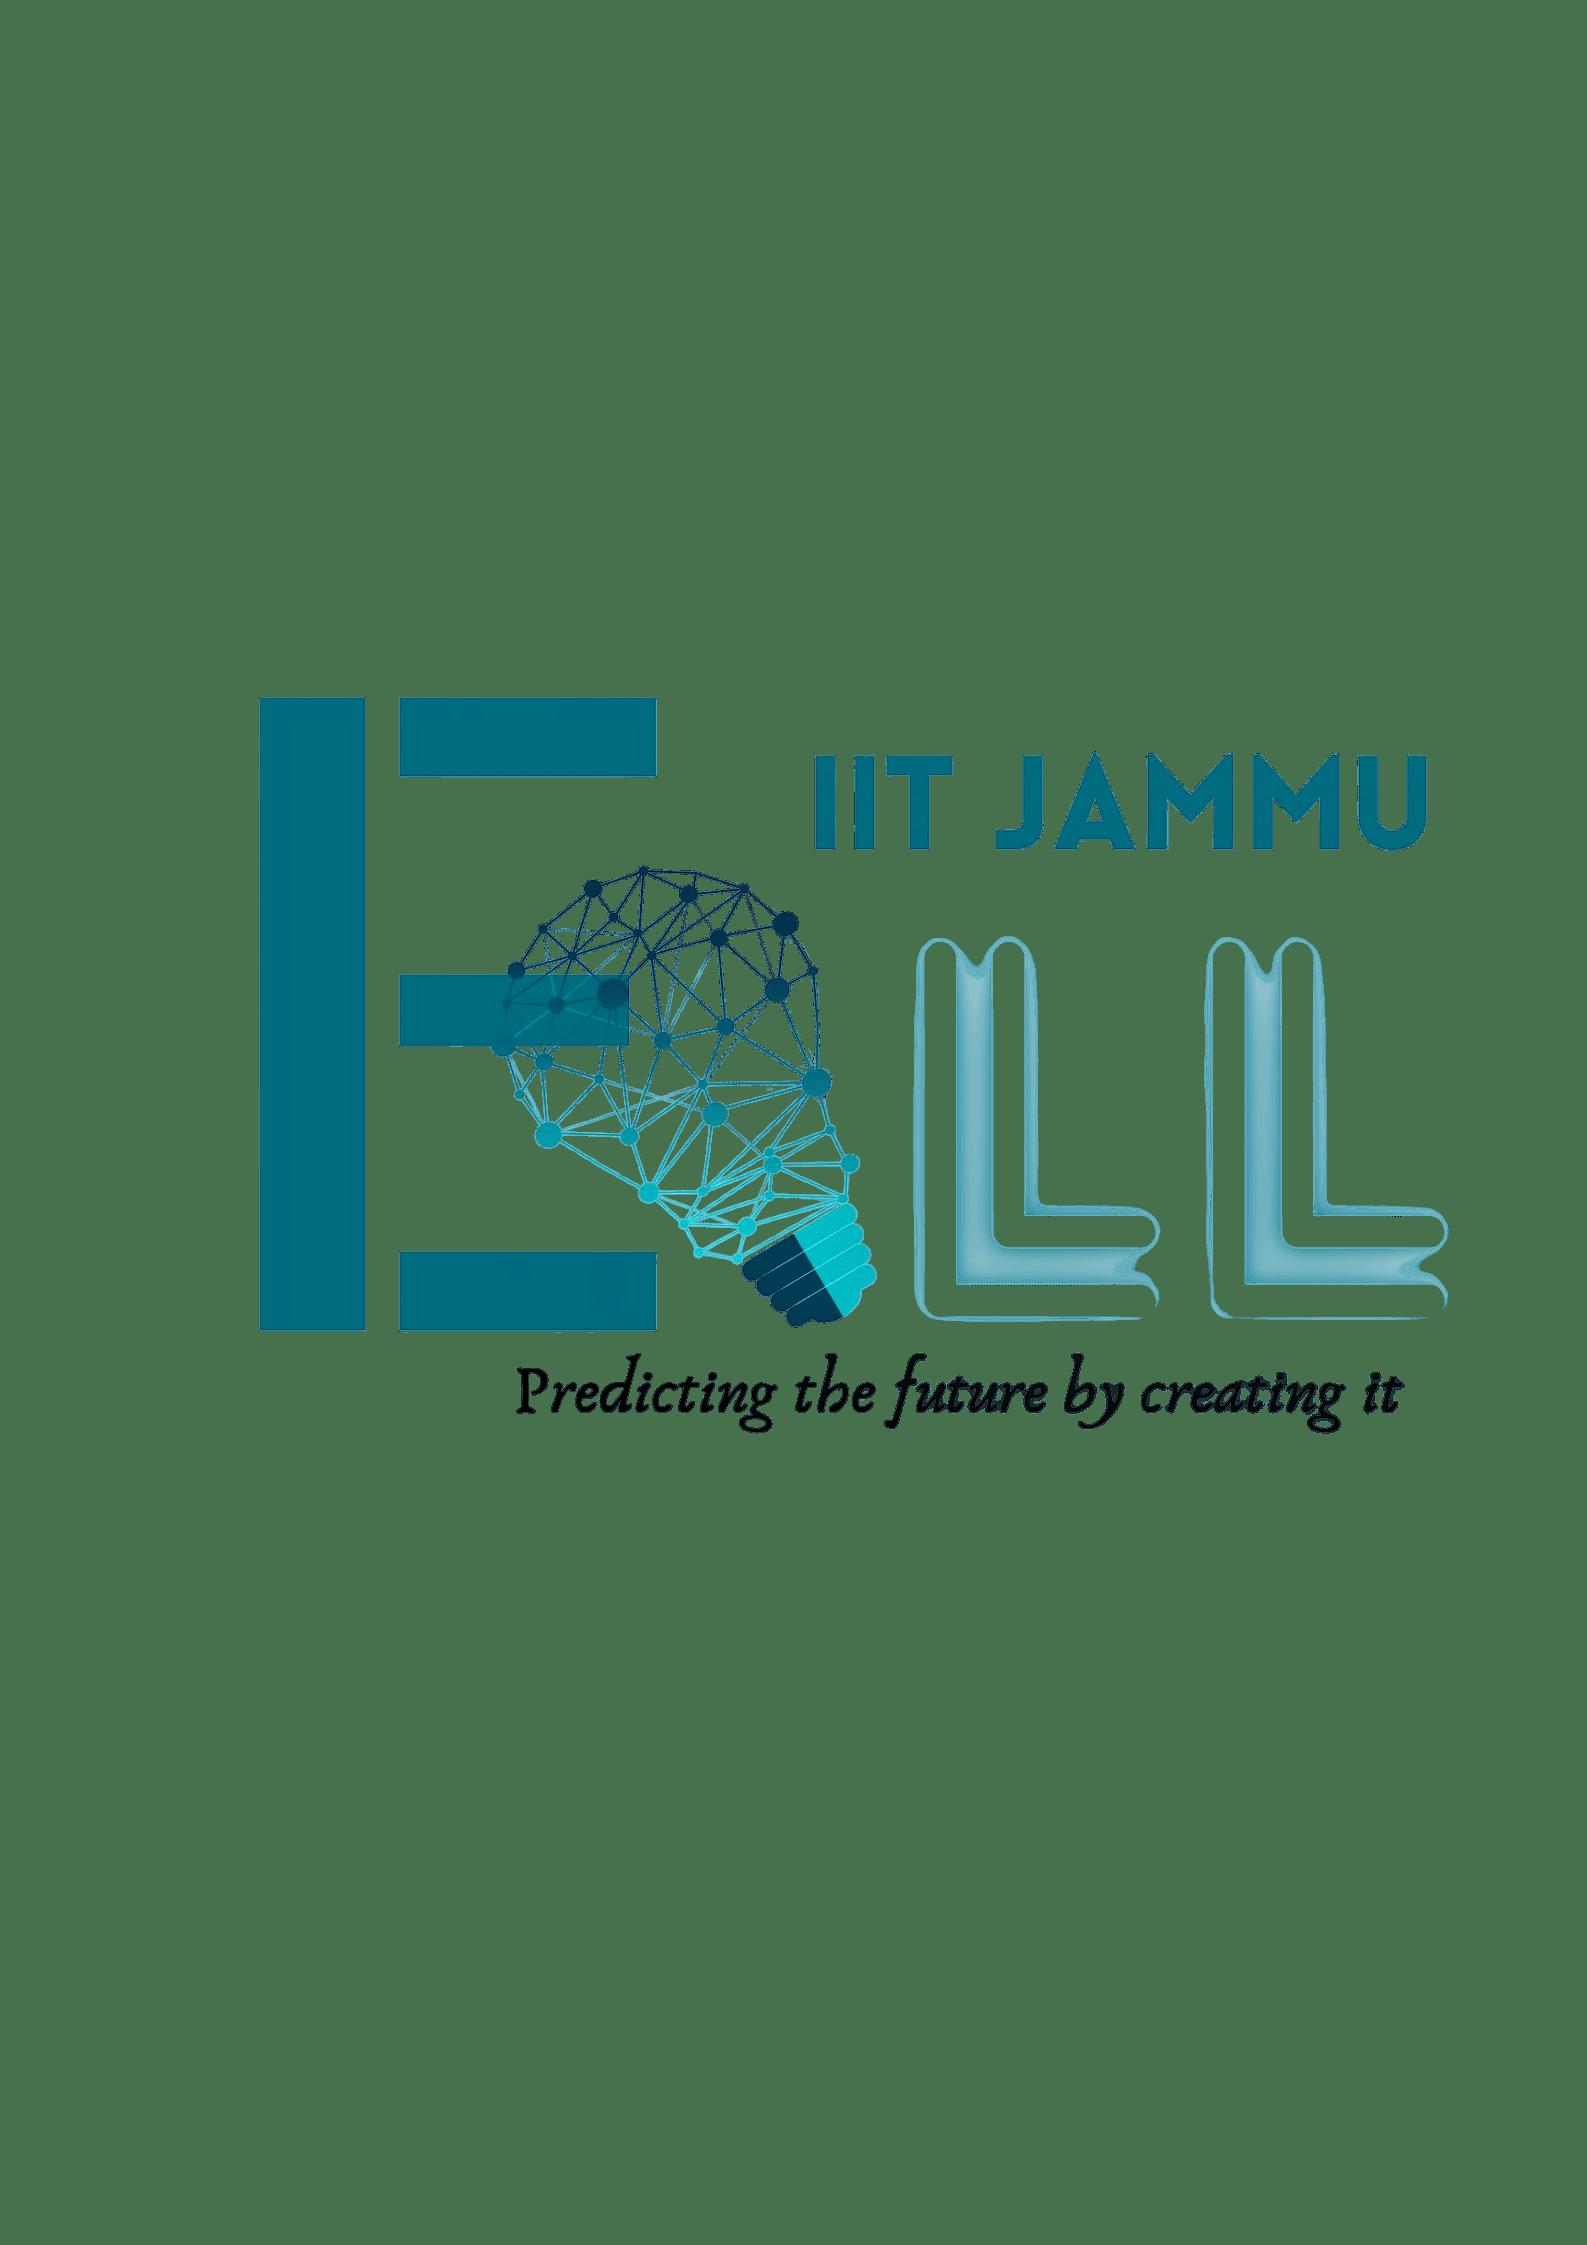 E-Cell IIT Jammu